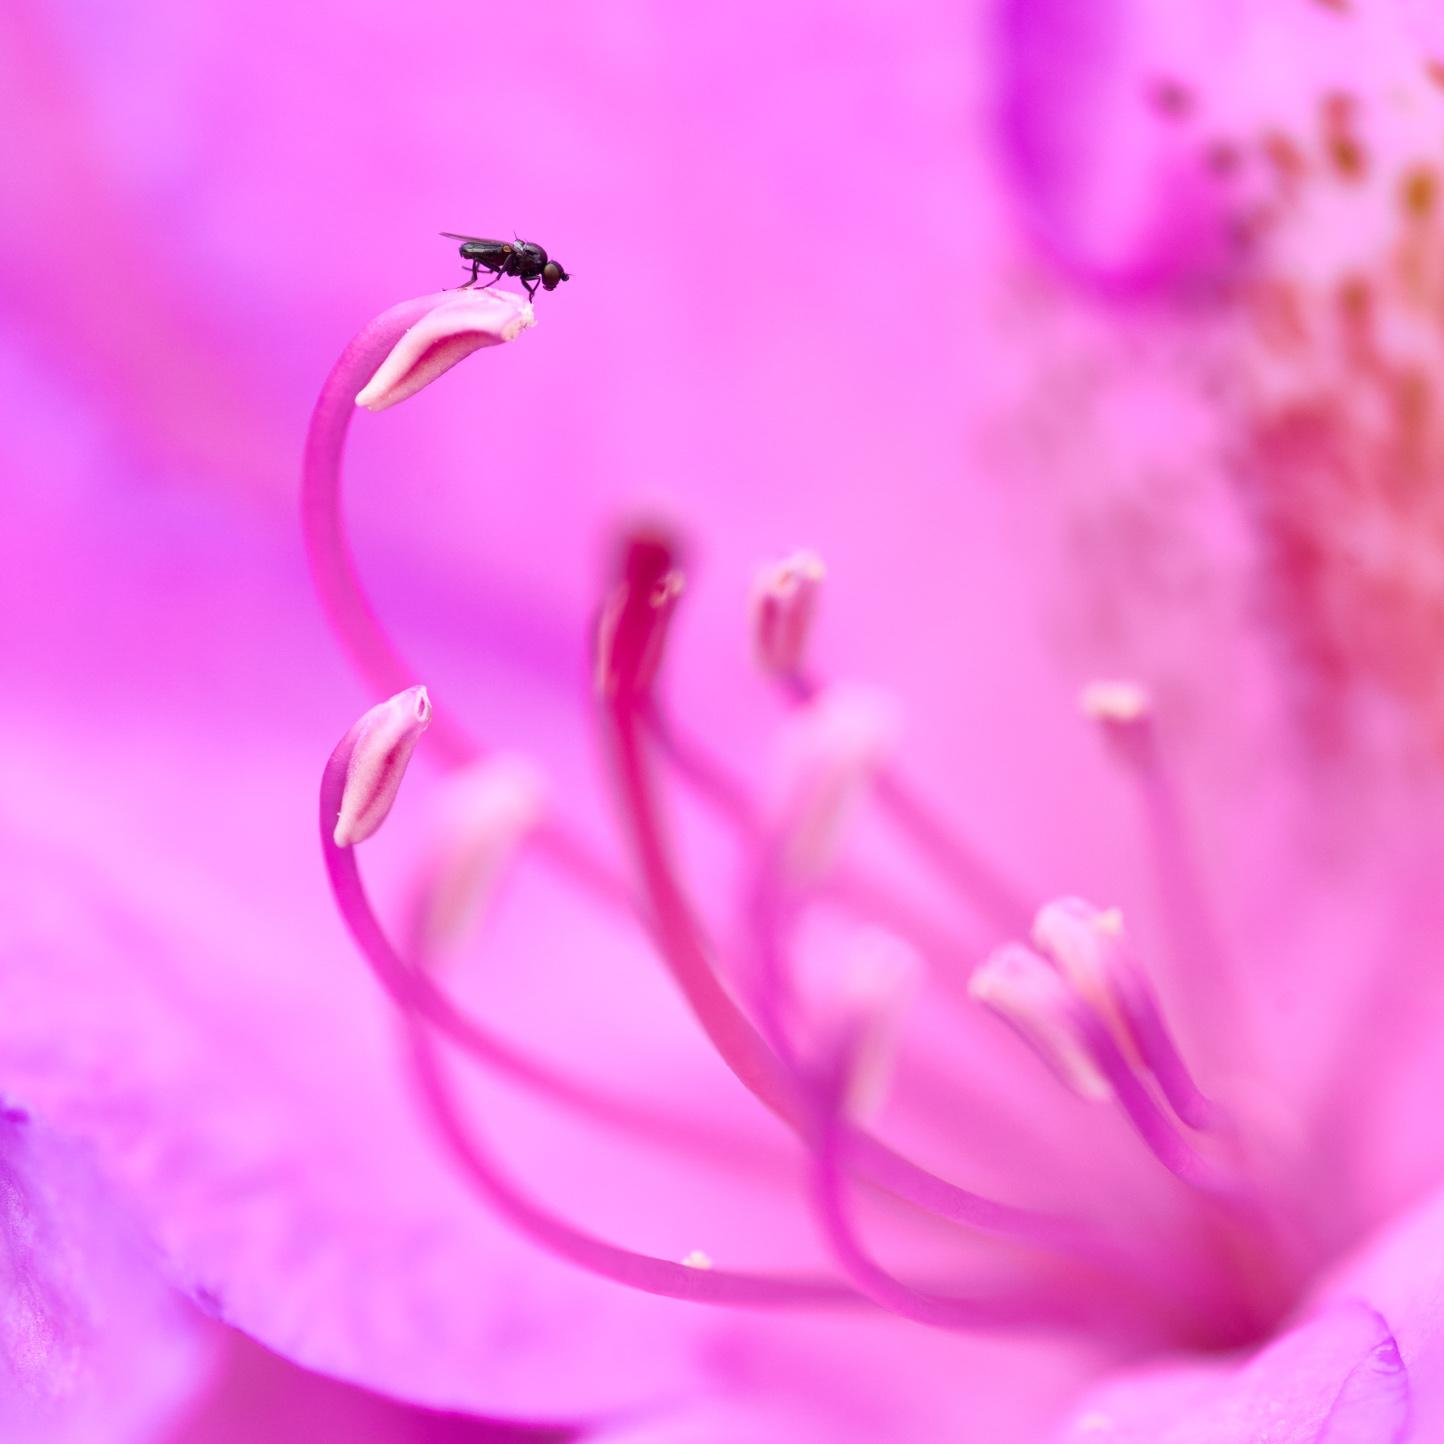 . Foto: Leif Ljungquist. Fluga i rhododendron.